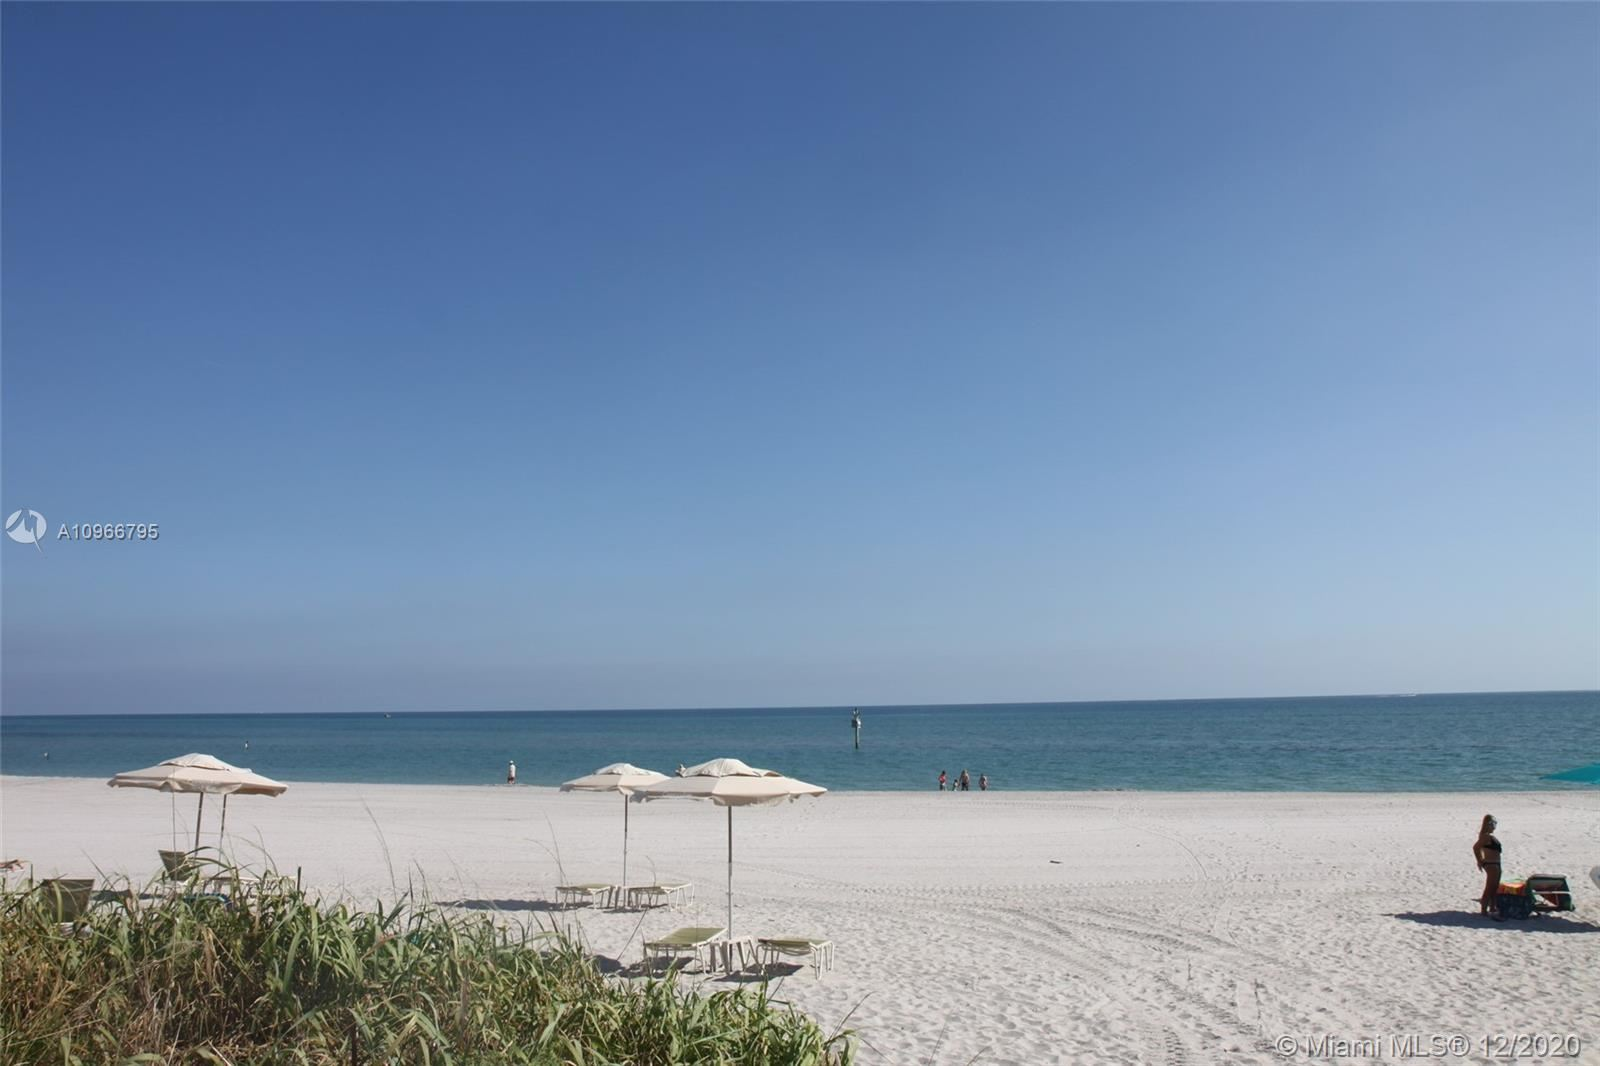 177 Ocean Lane Dr #202, Key Biscayne, FL 33149 - #: A10966795